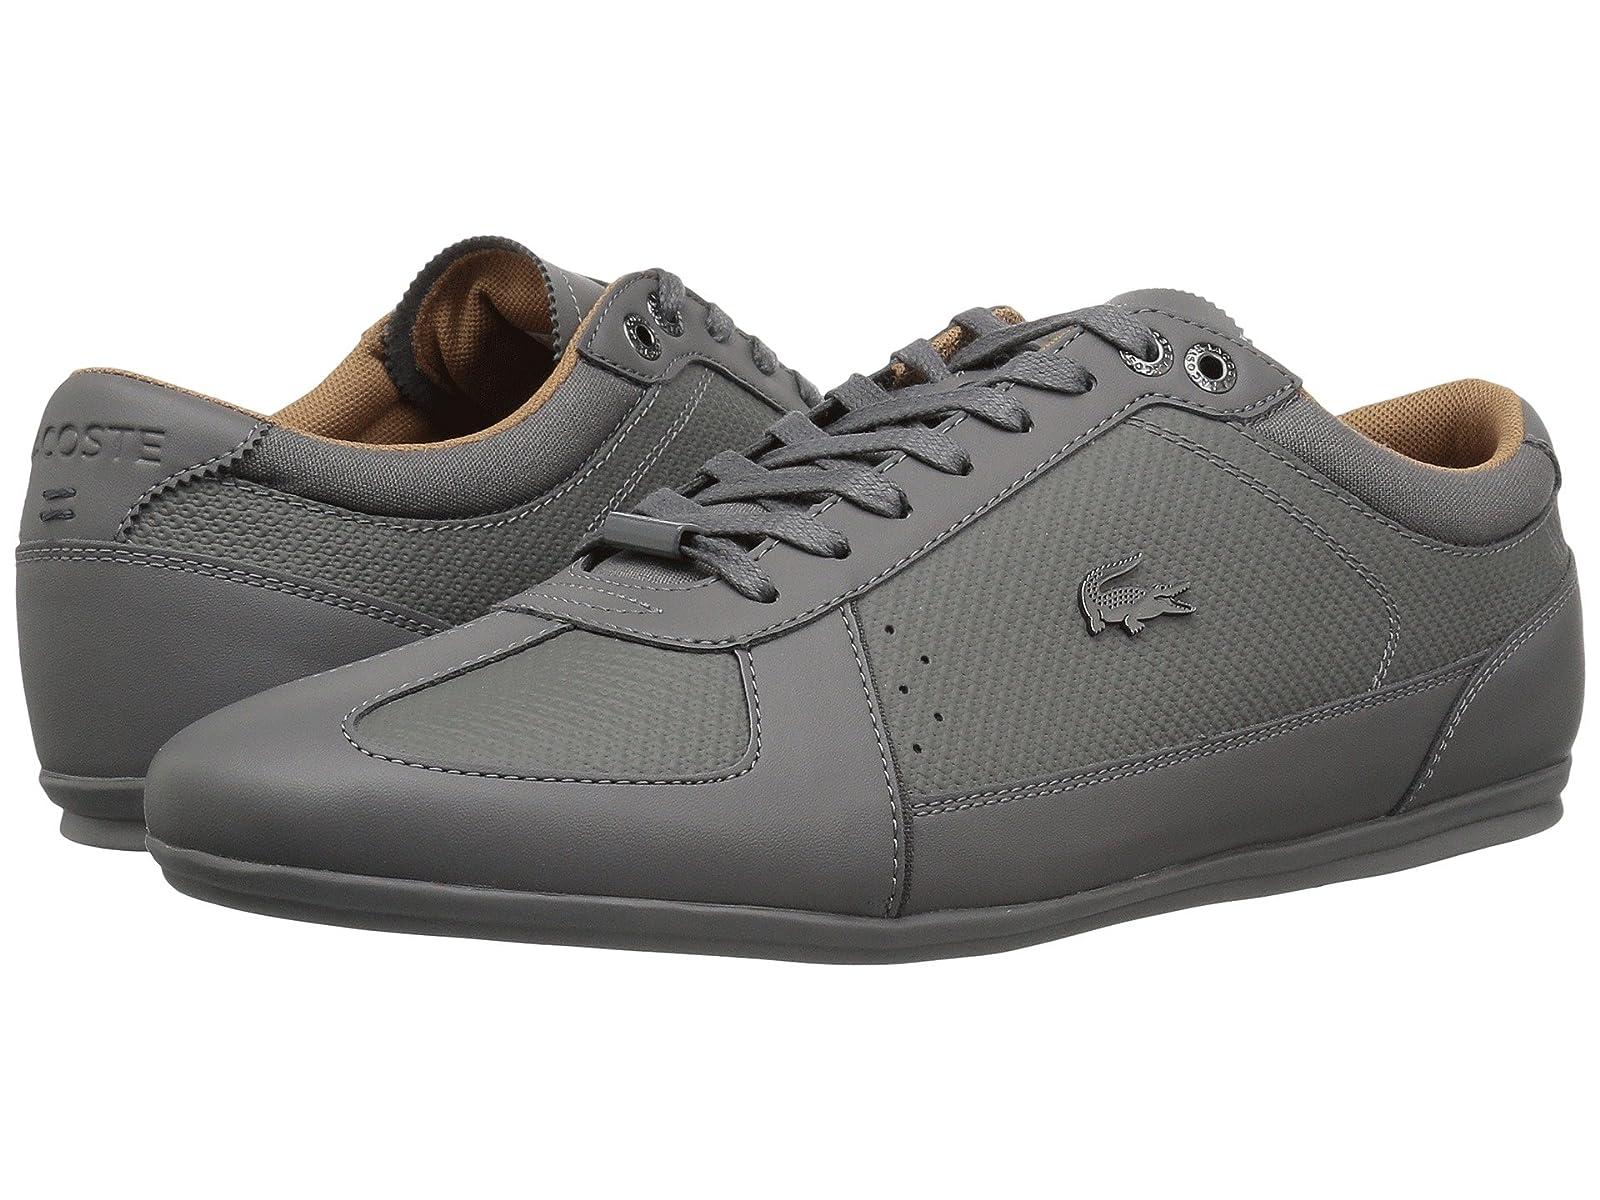 Lacoste Evara 118 2Atmospheric grades have affordable shoes